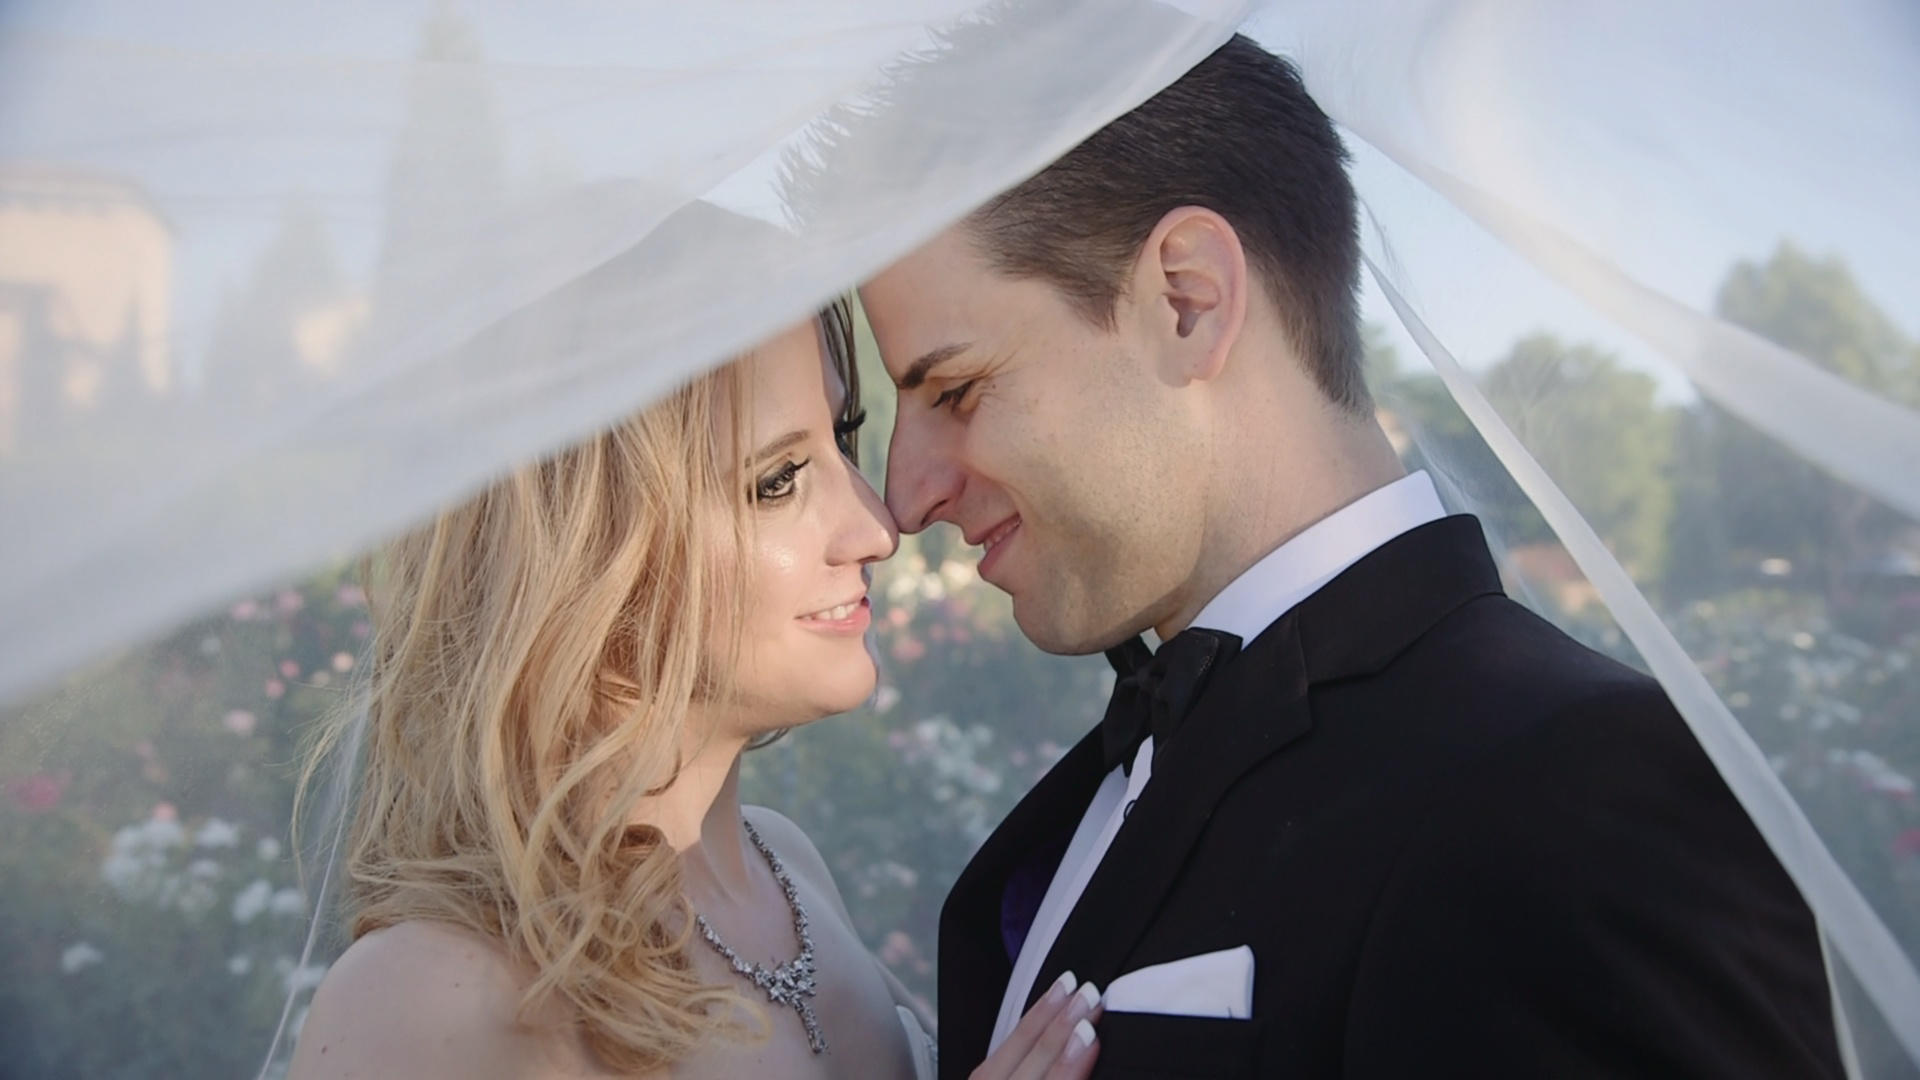 Candace and chris wedding